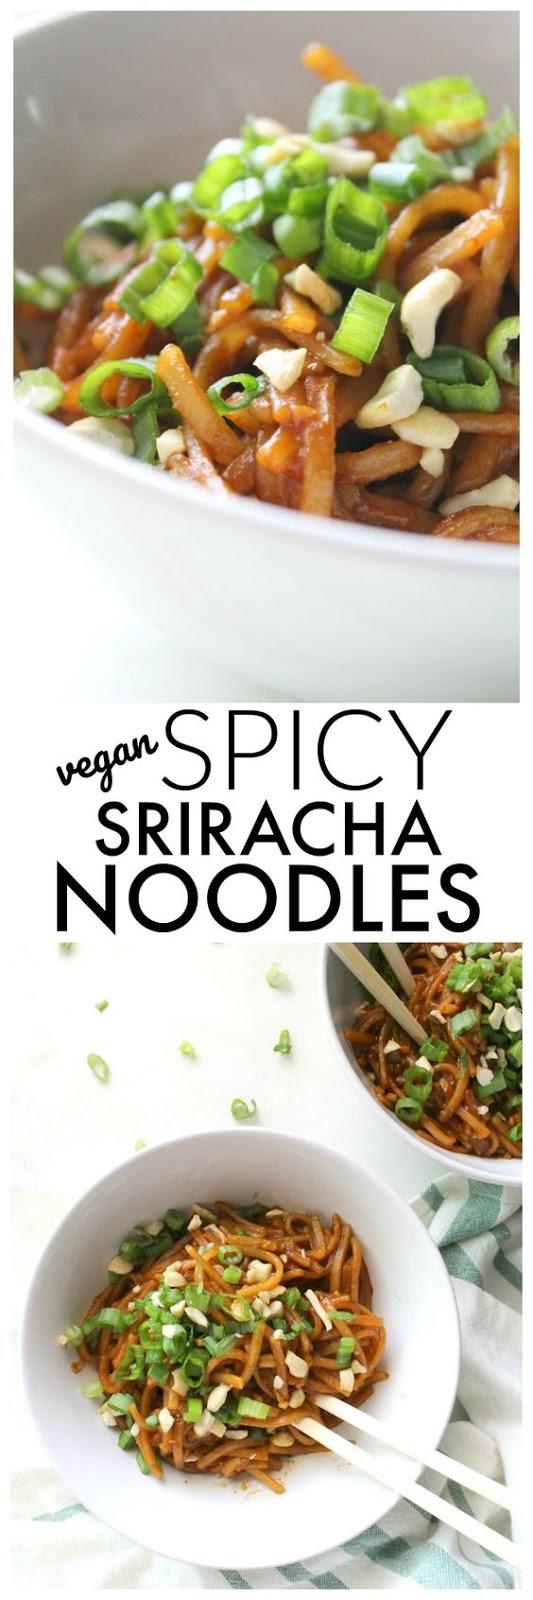 Spicy Vegan Sriracha Noodles Recipe